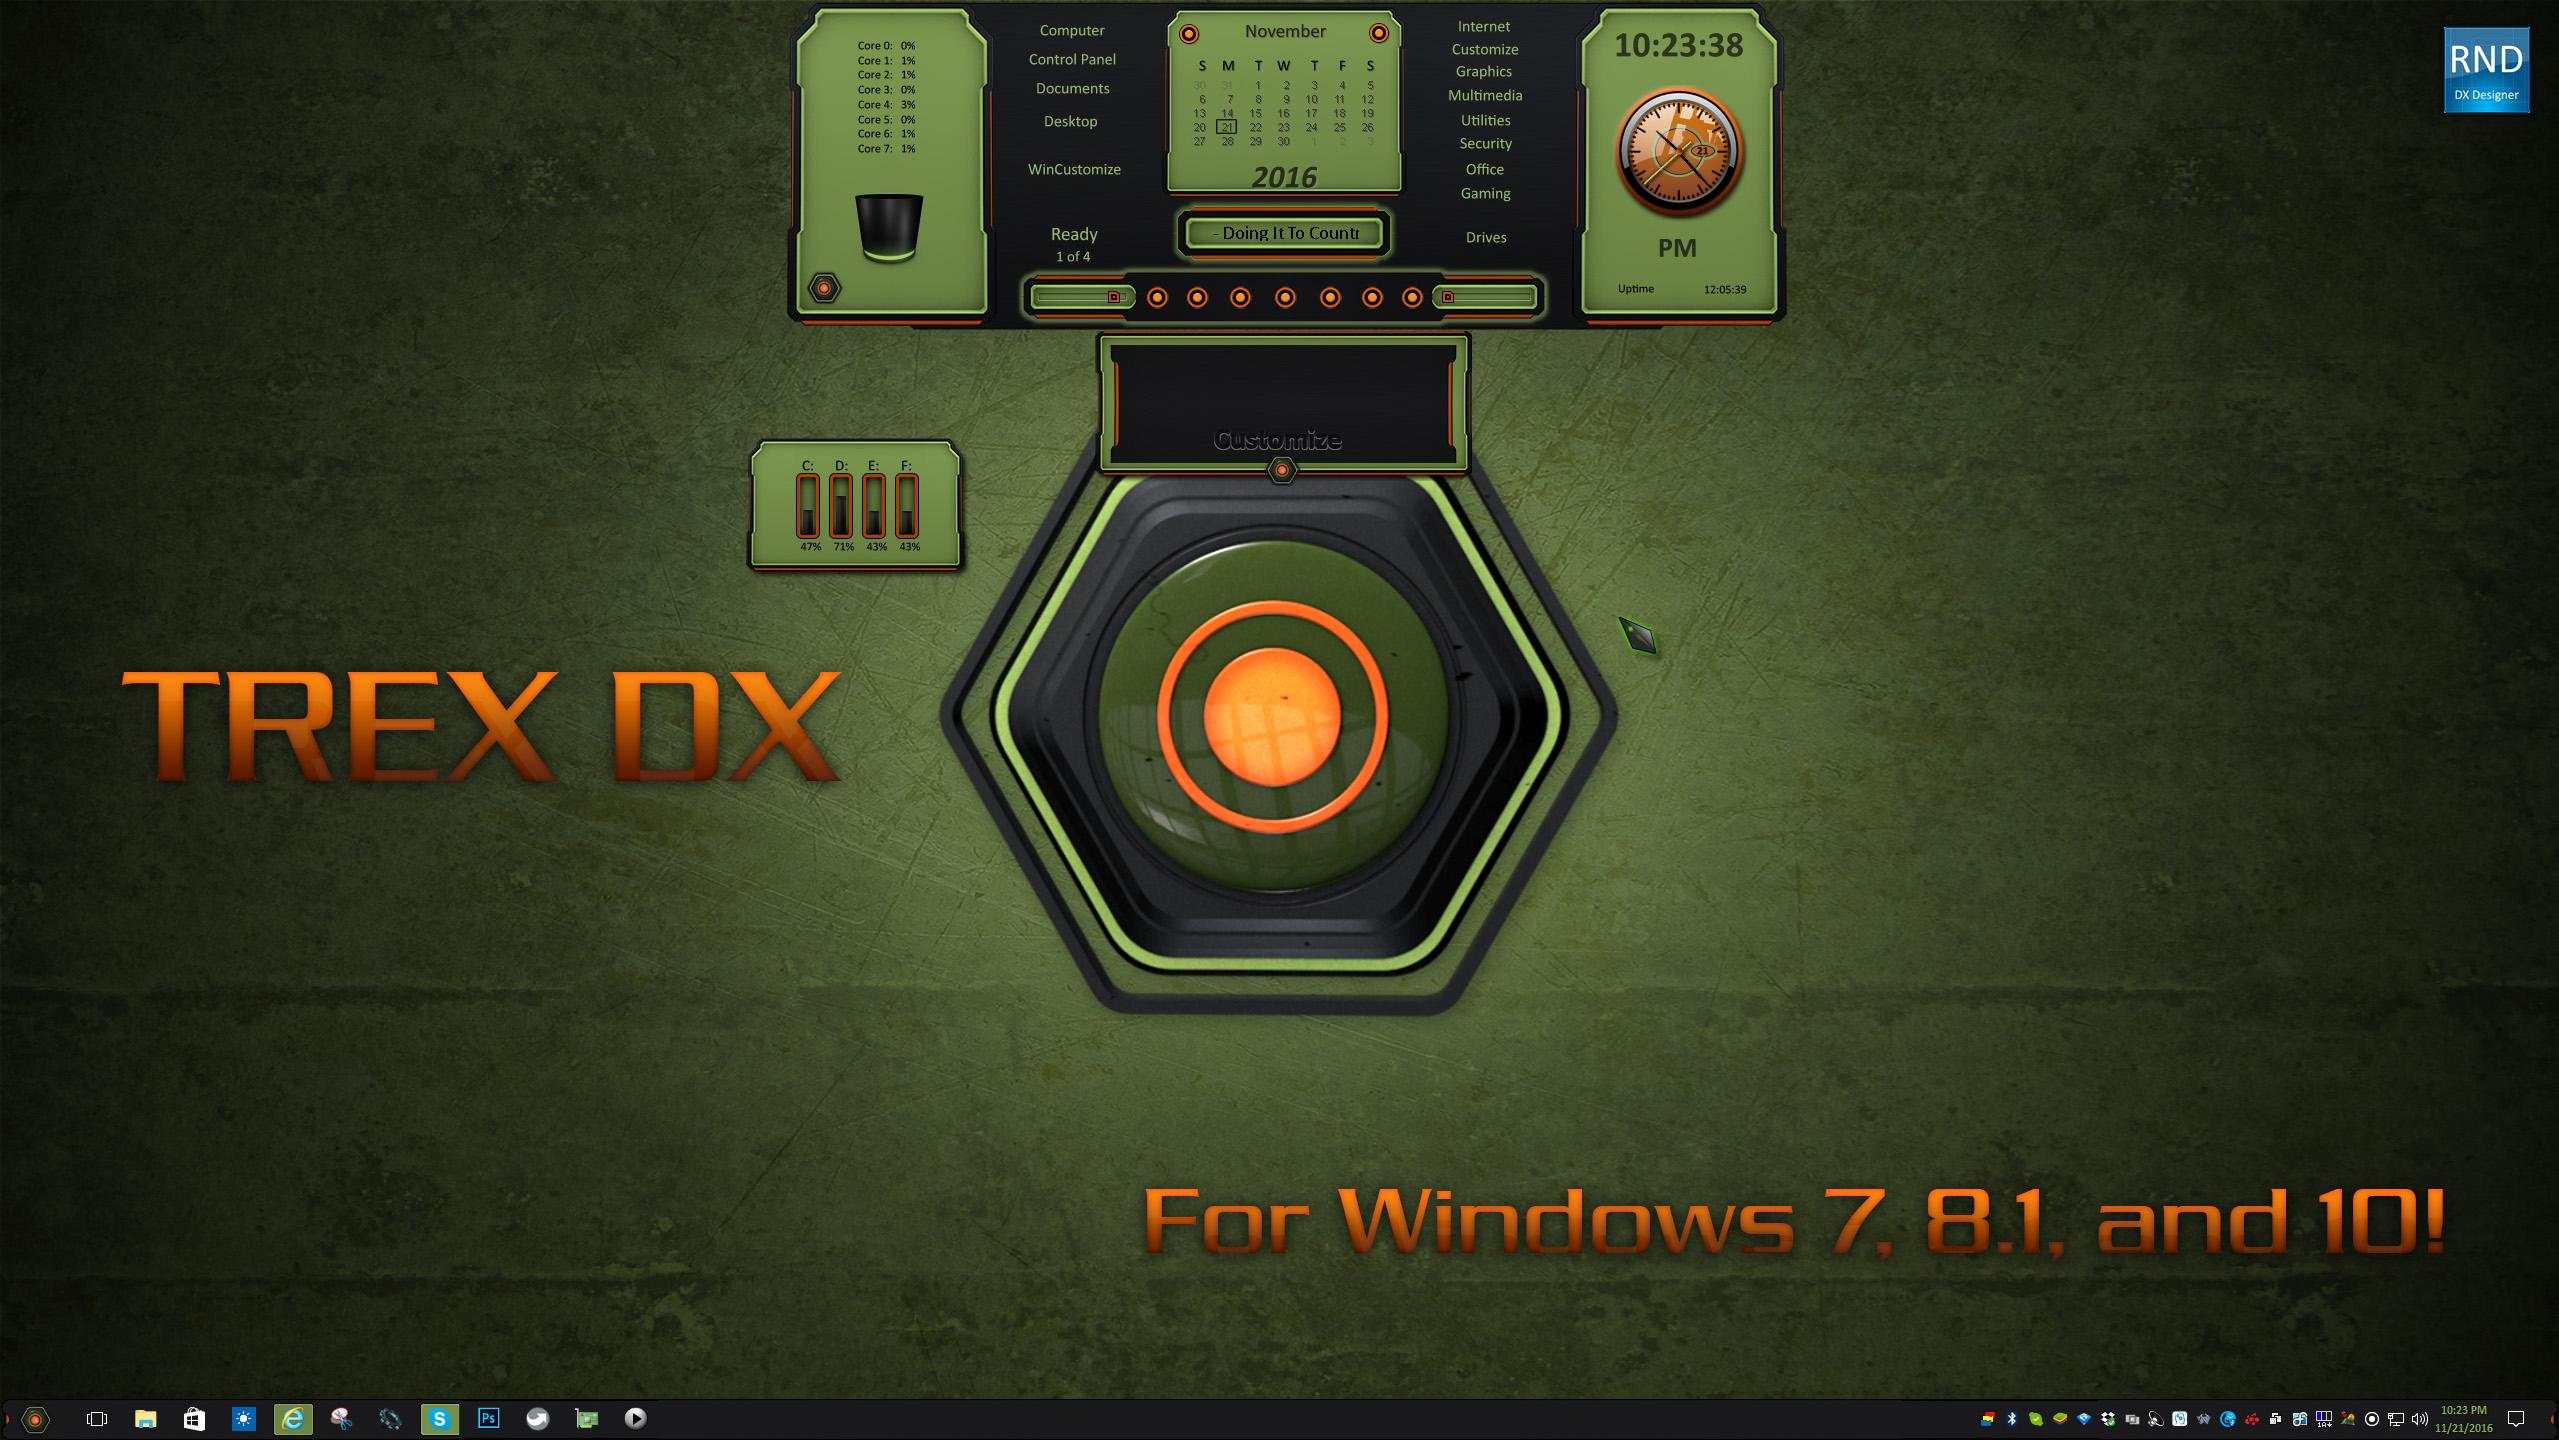 Trex DX